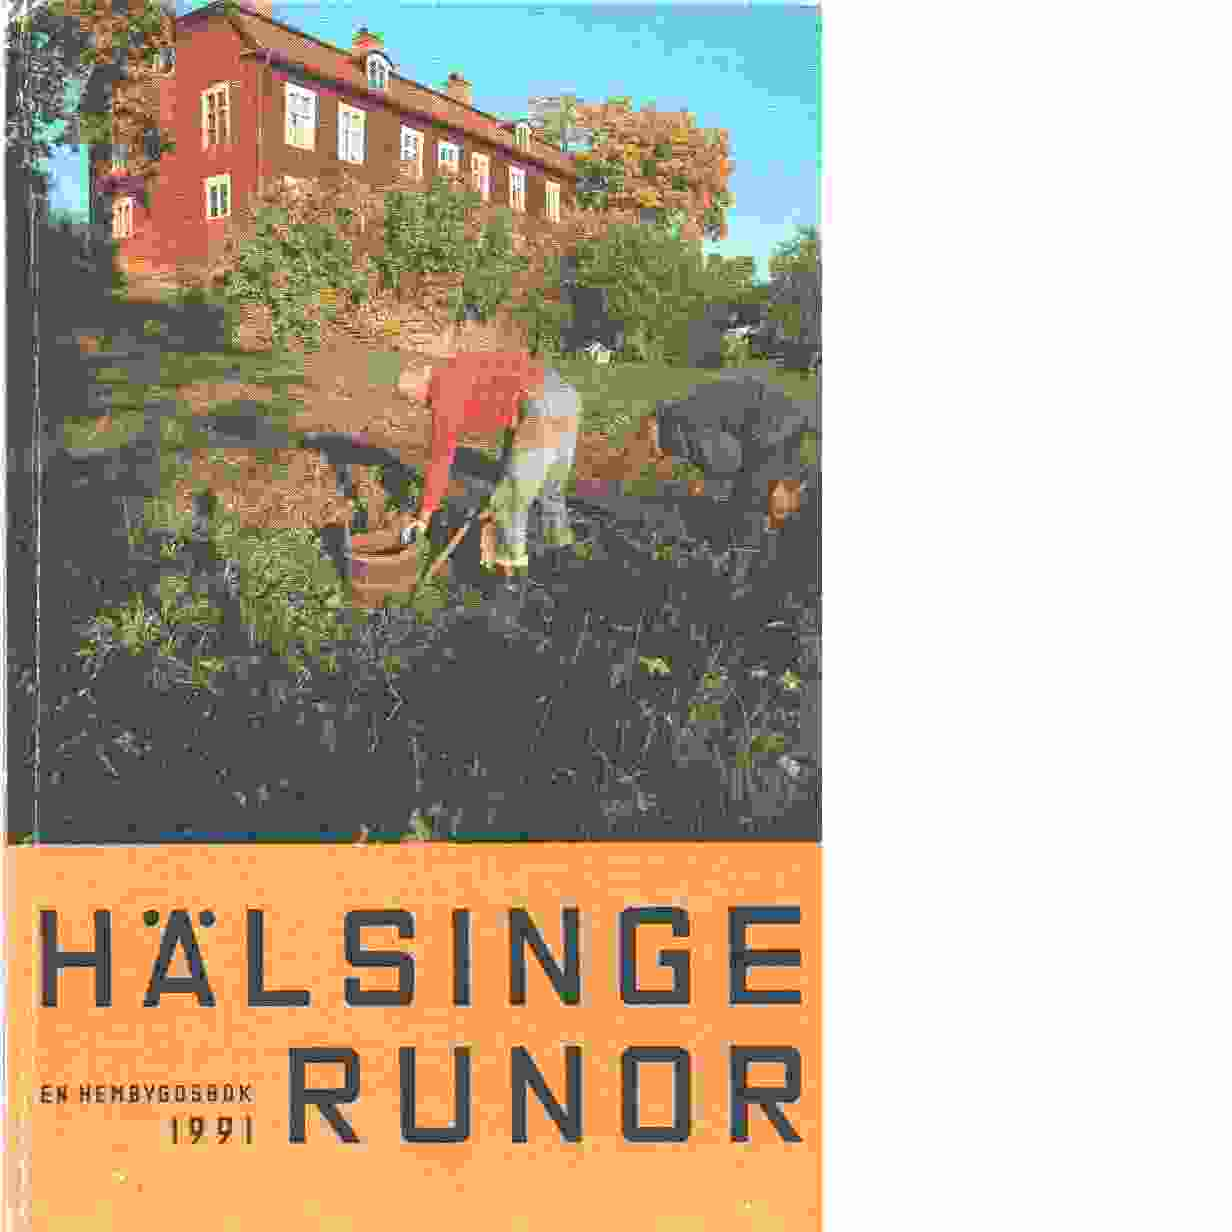 Hälsingerunor 1991 - Red.